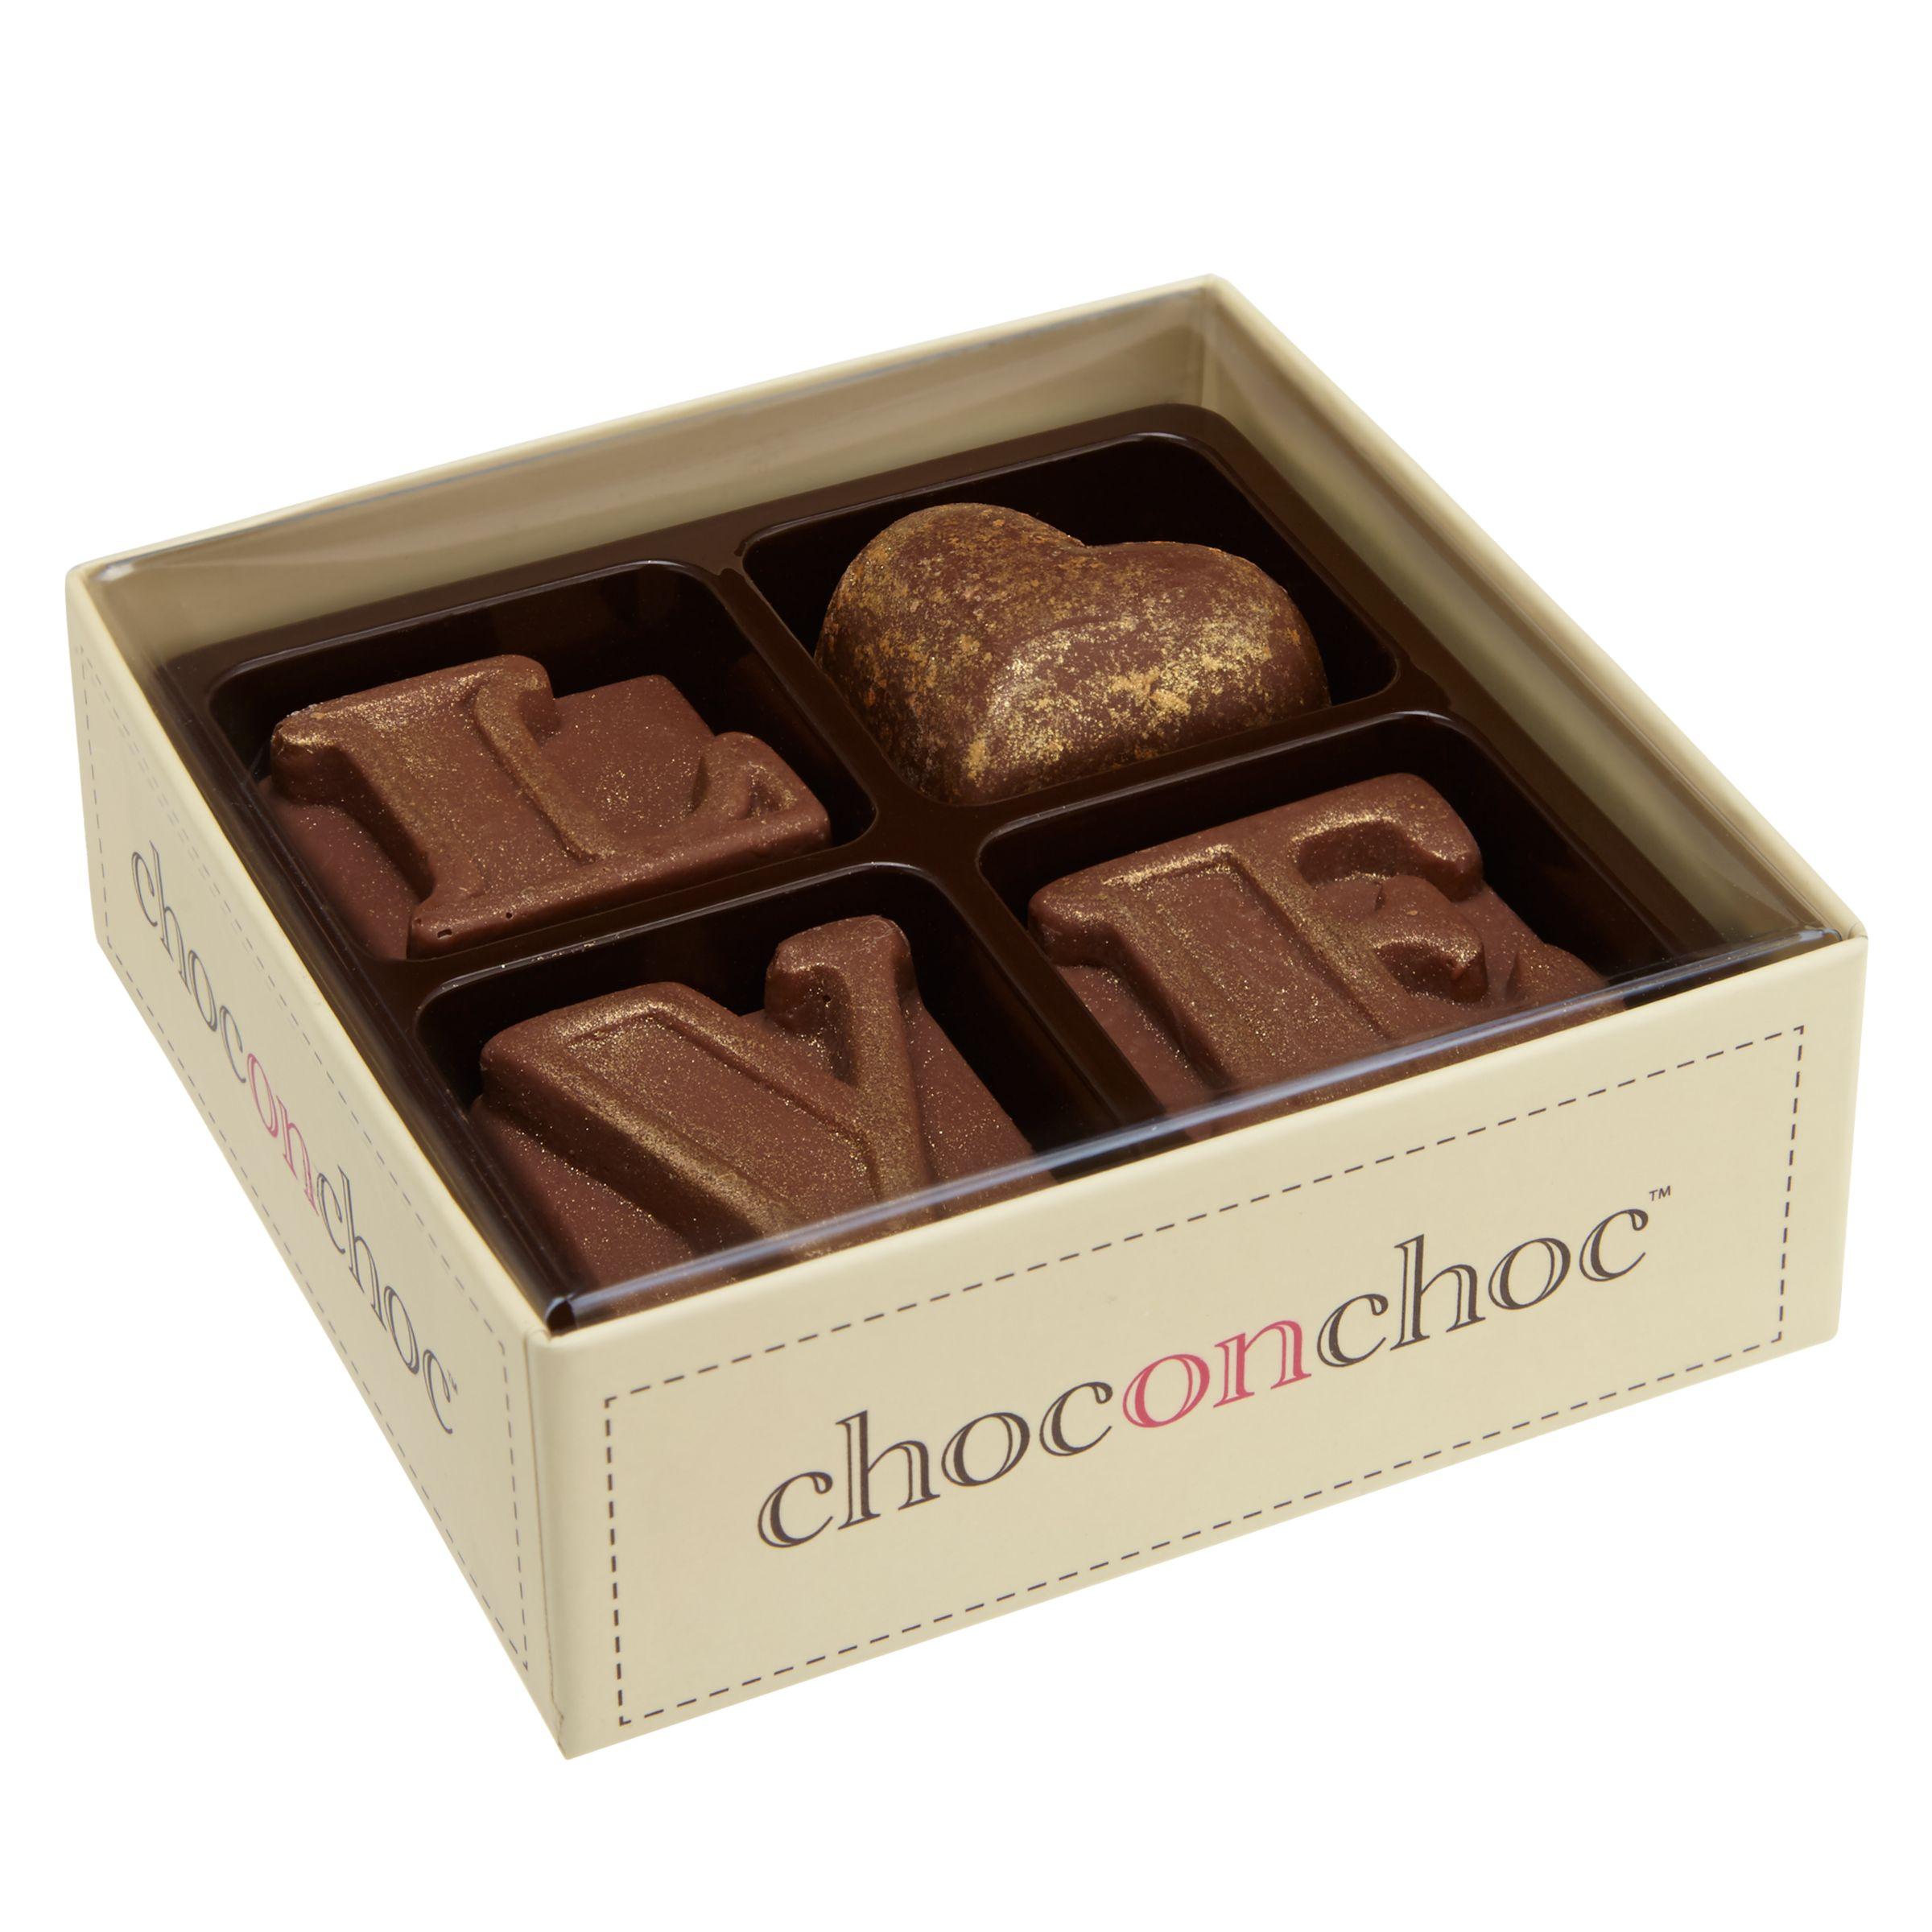 Choc on Choc Choc on Choc Gold Heart Love Chocolates, 50g